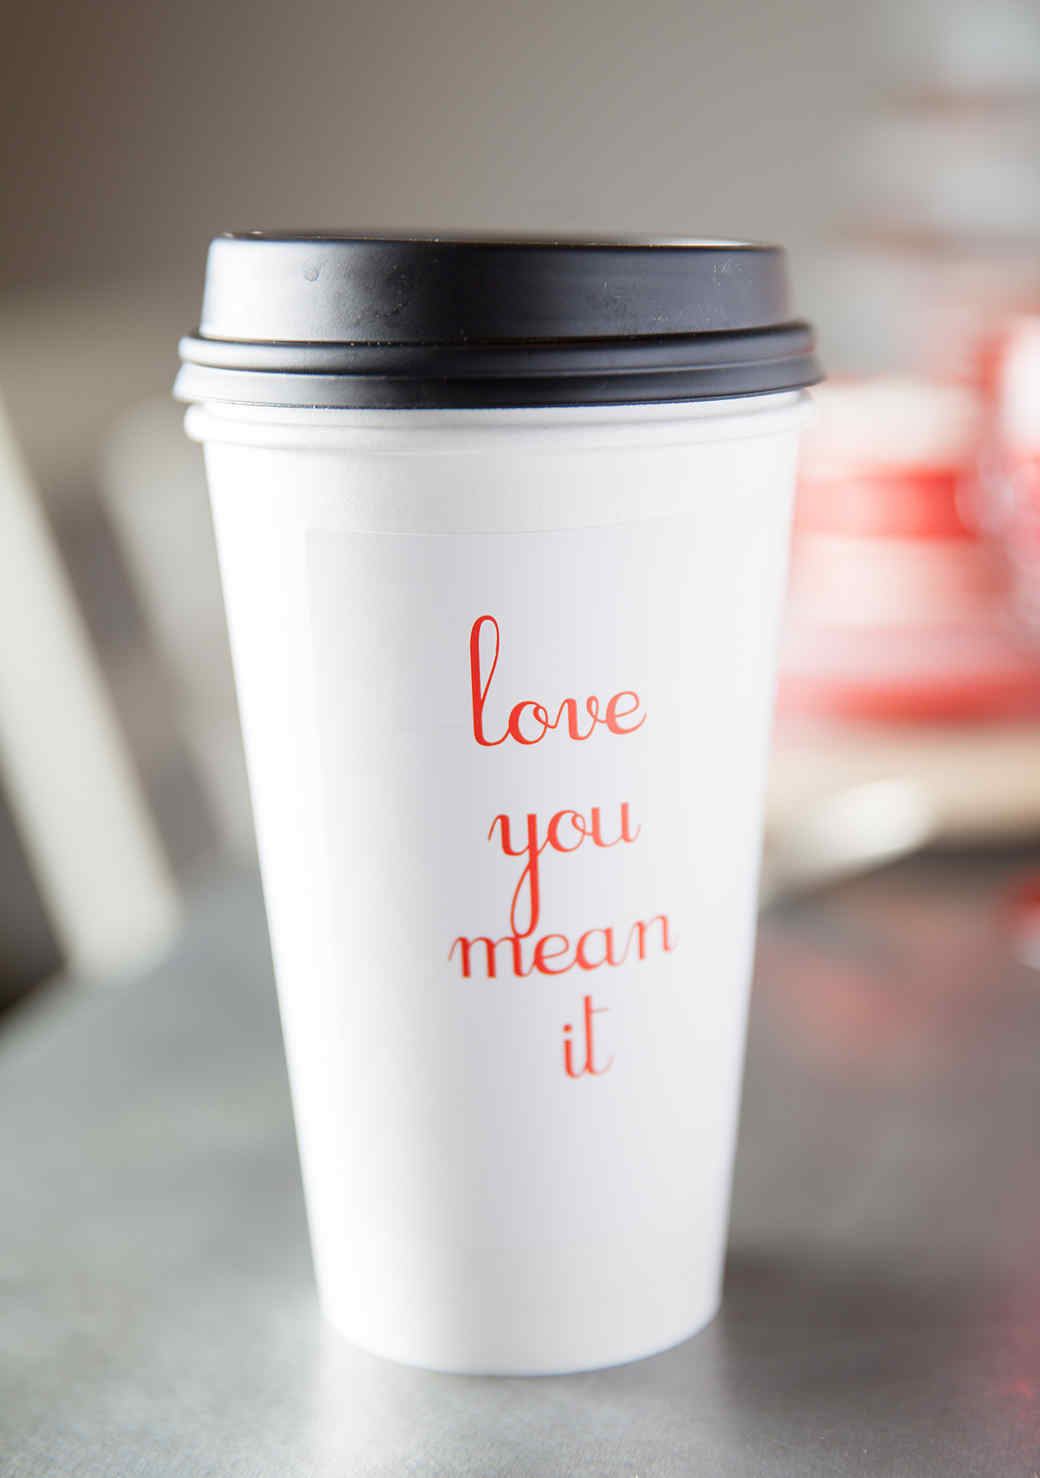 galentines-custom-coffee-cups0216.jpg (skyword:227078)